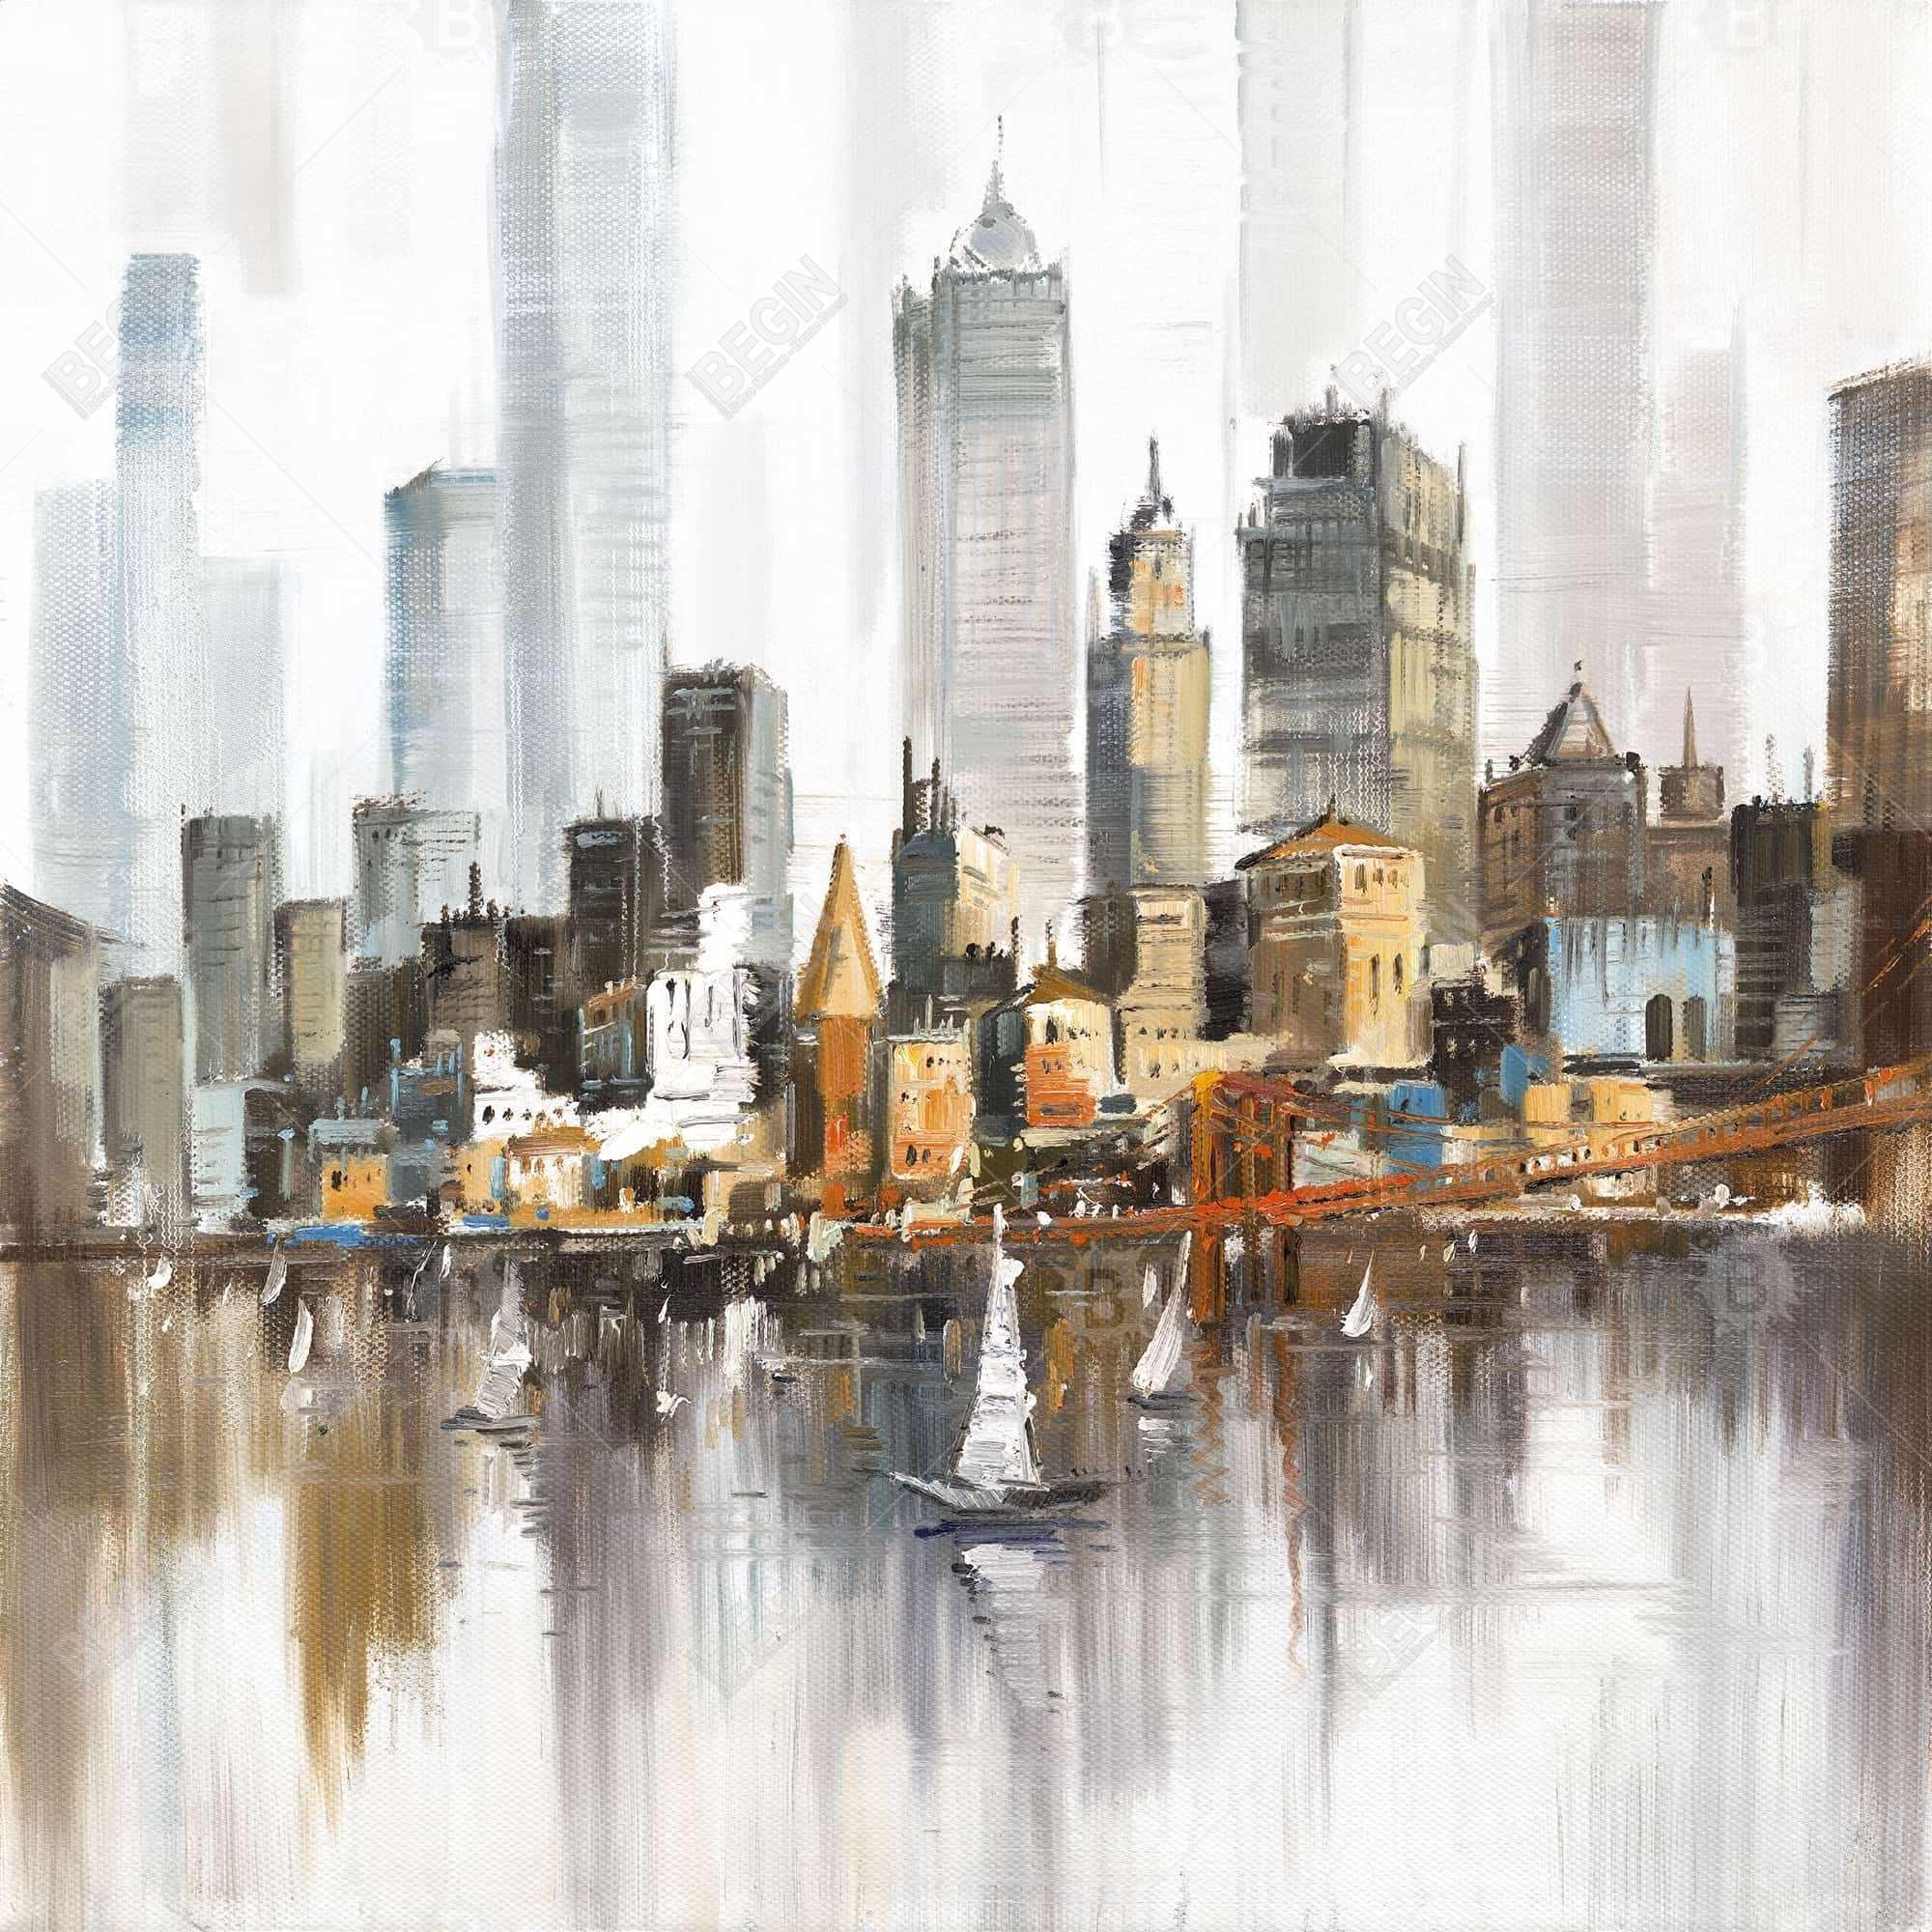 Urban landscape and its sailboats